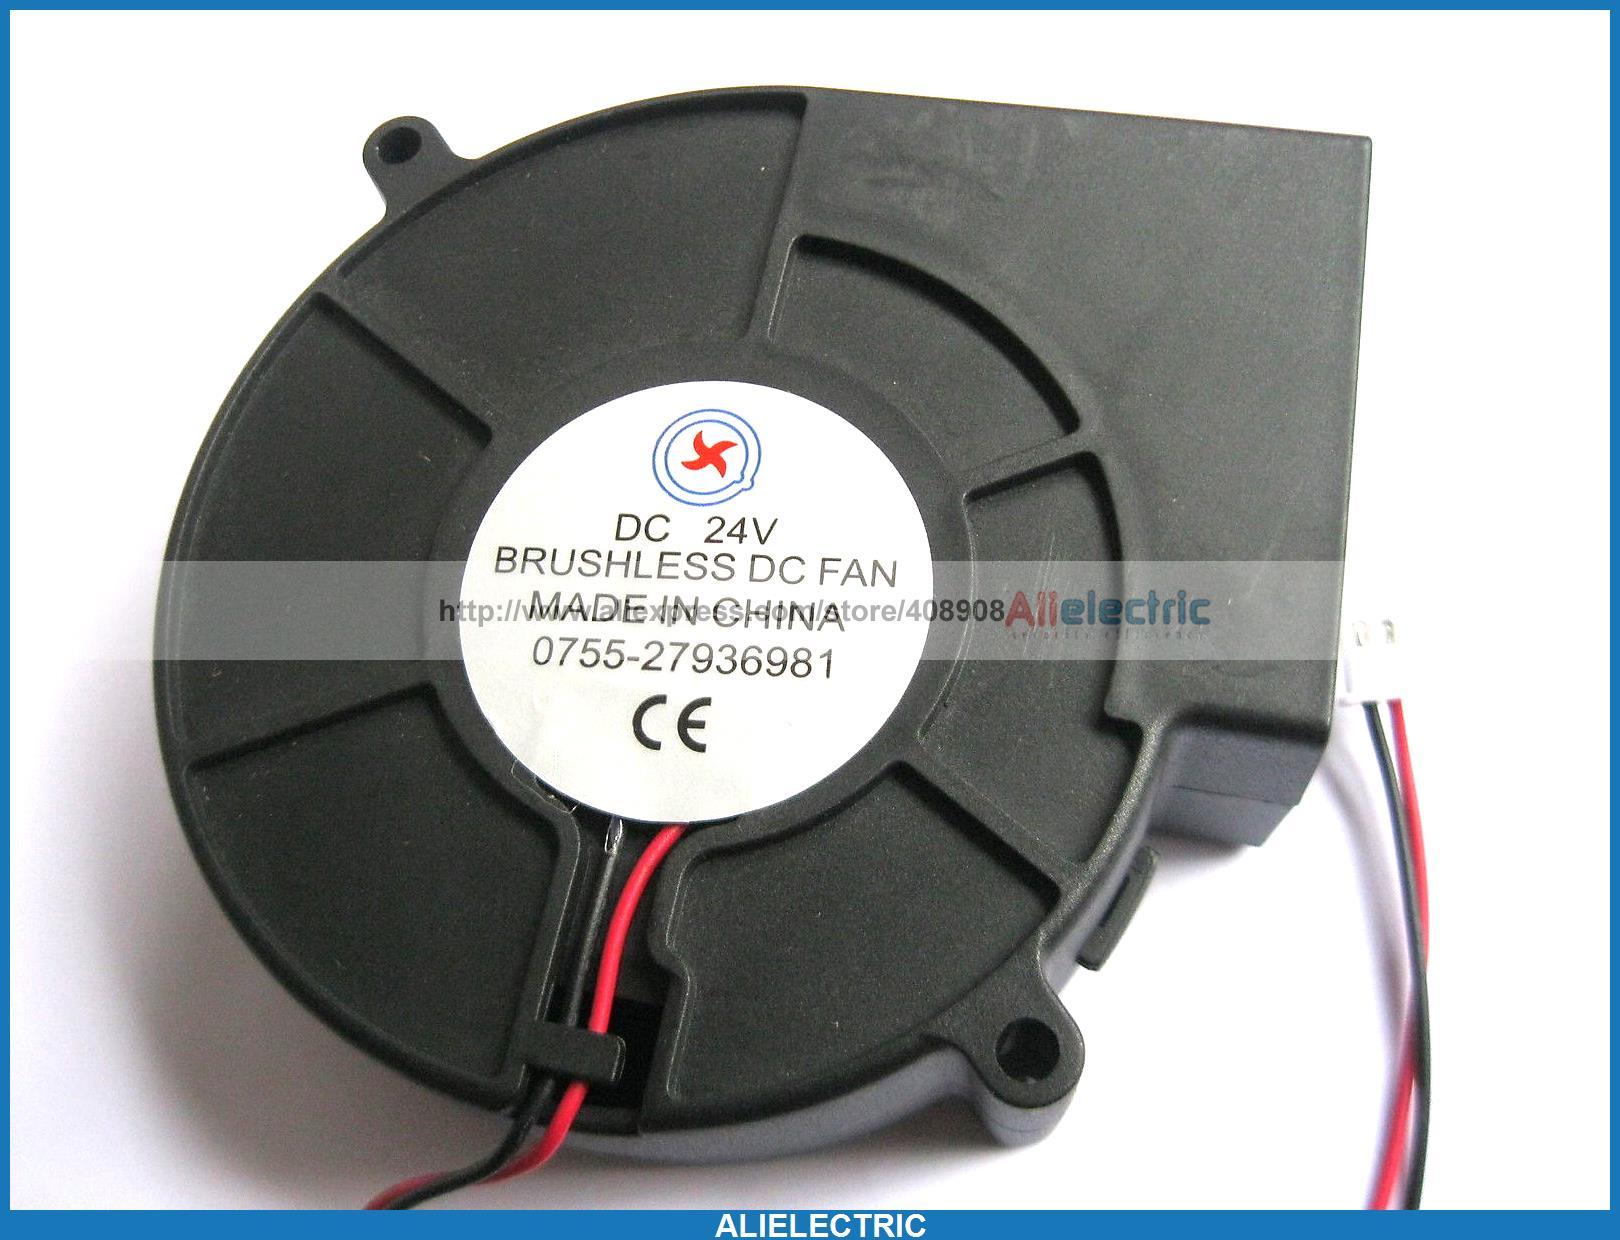 4 x Brushless DC Cooling Blower Fan 9733 24V 9733s 2pin 9733 blower cooling fan 12 volt brushless dc fans centrifugal turbo fan cooler radiator